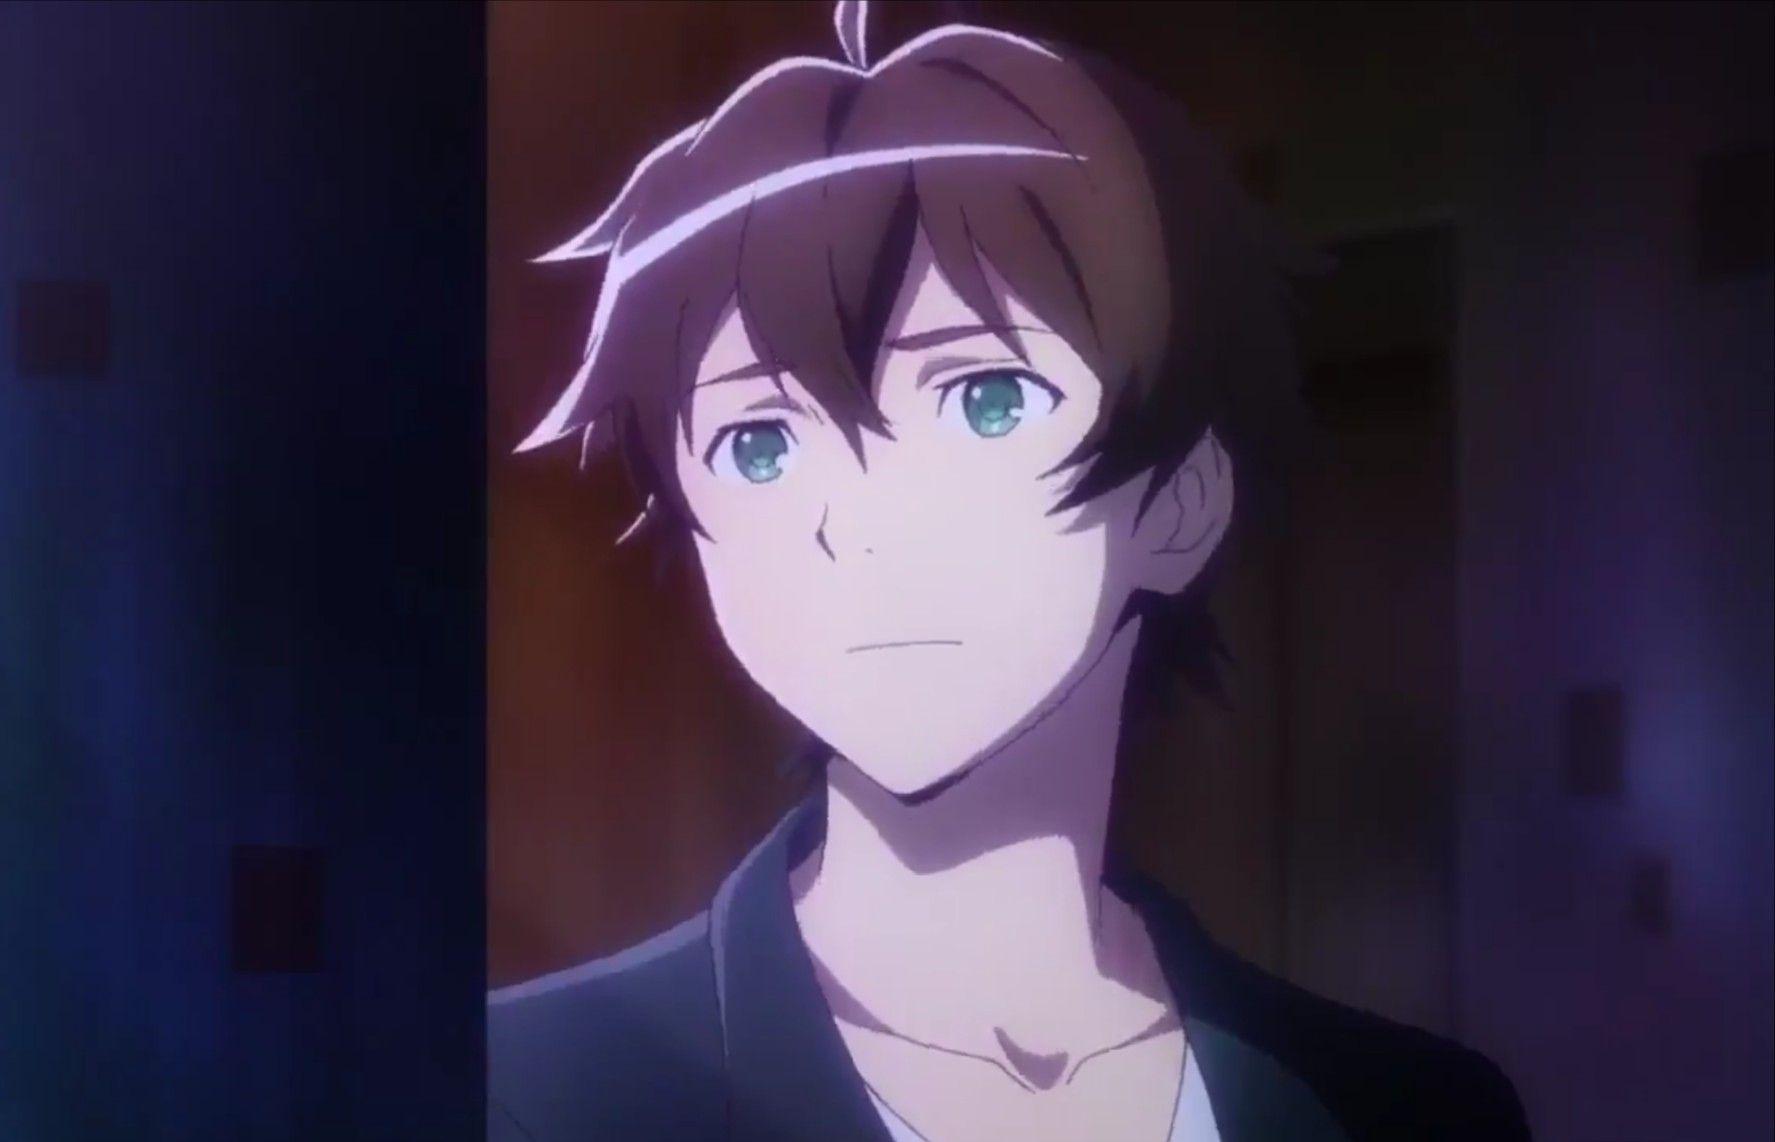 Plastic Memories In 2020 Plastic Memories Cute Anime Boy Anime